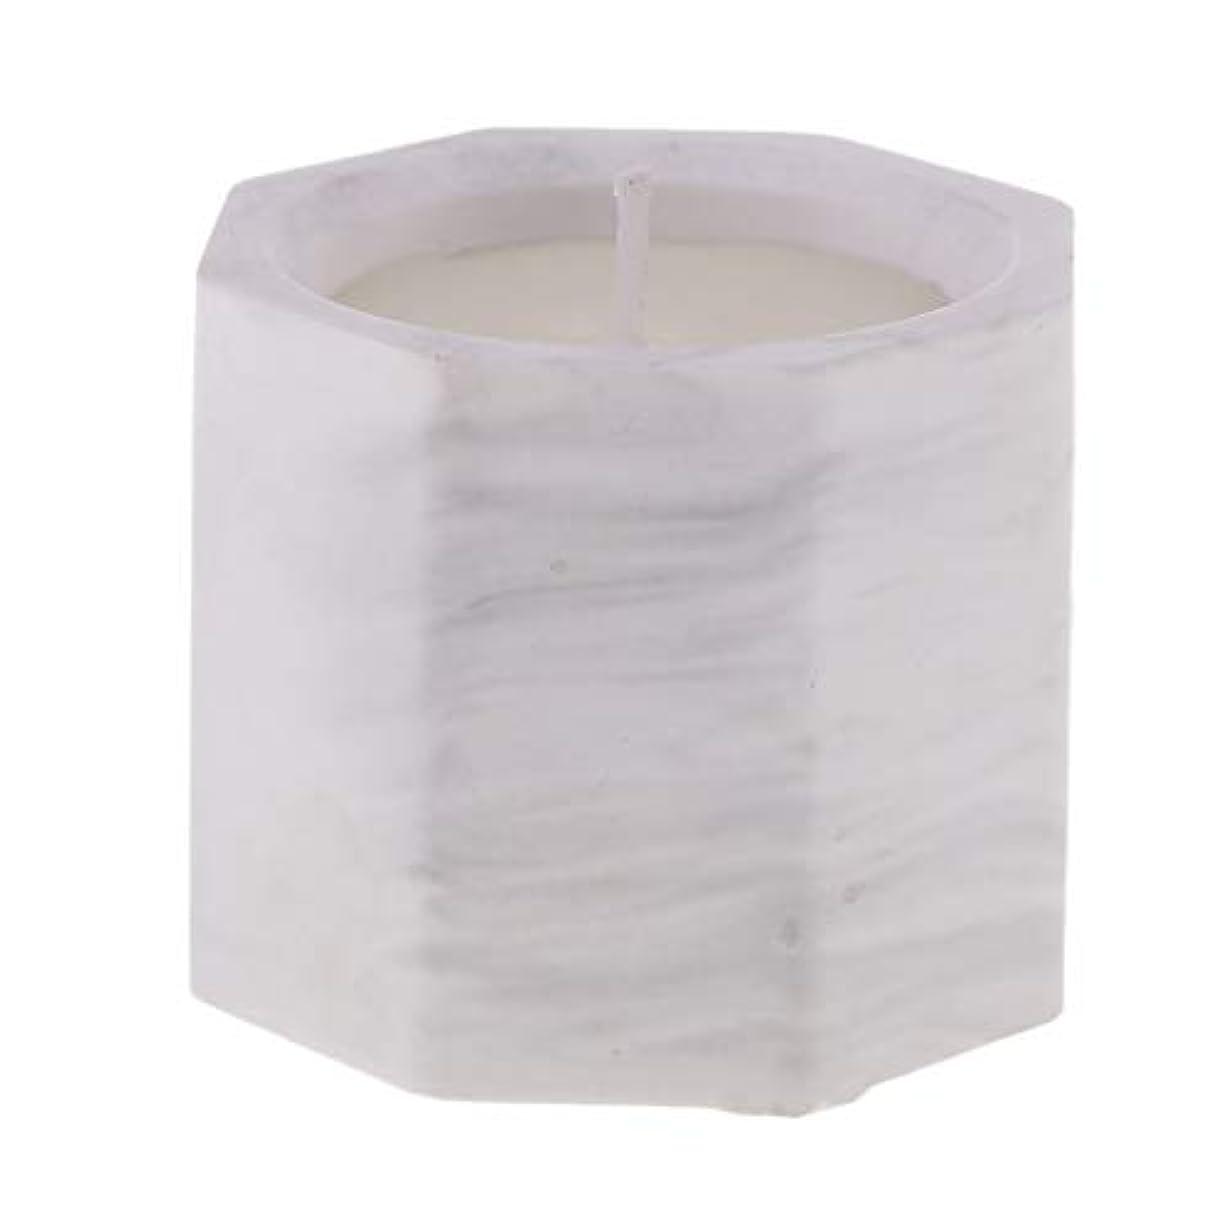 D DOLITY アロマキャンドル オクタゴン形 香りキャンドル 友人用 誕生日用 家族用 約58mm